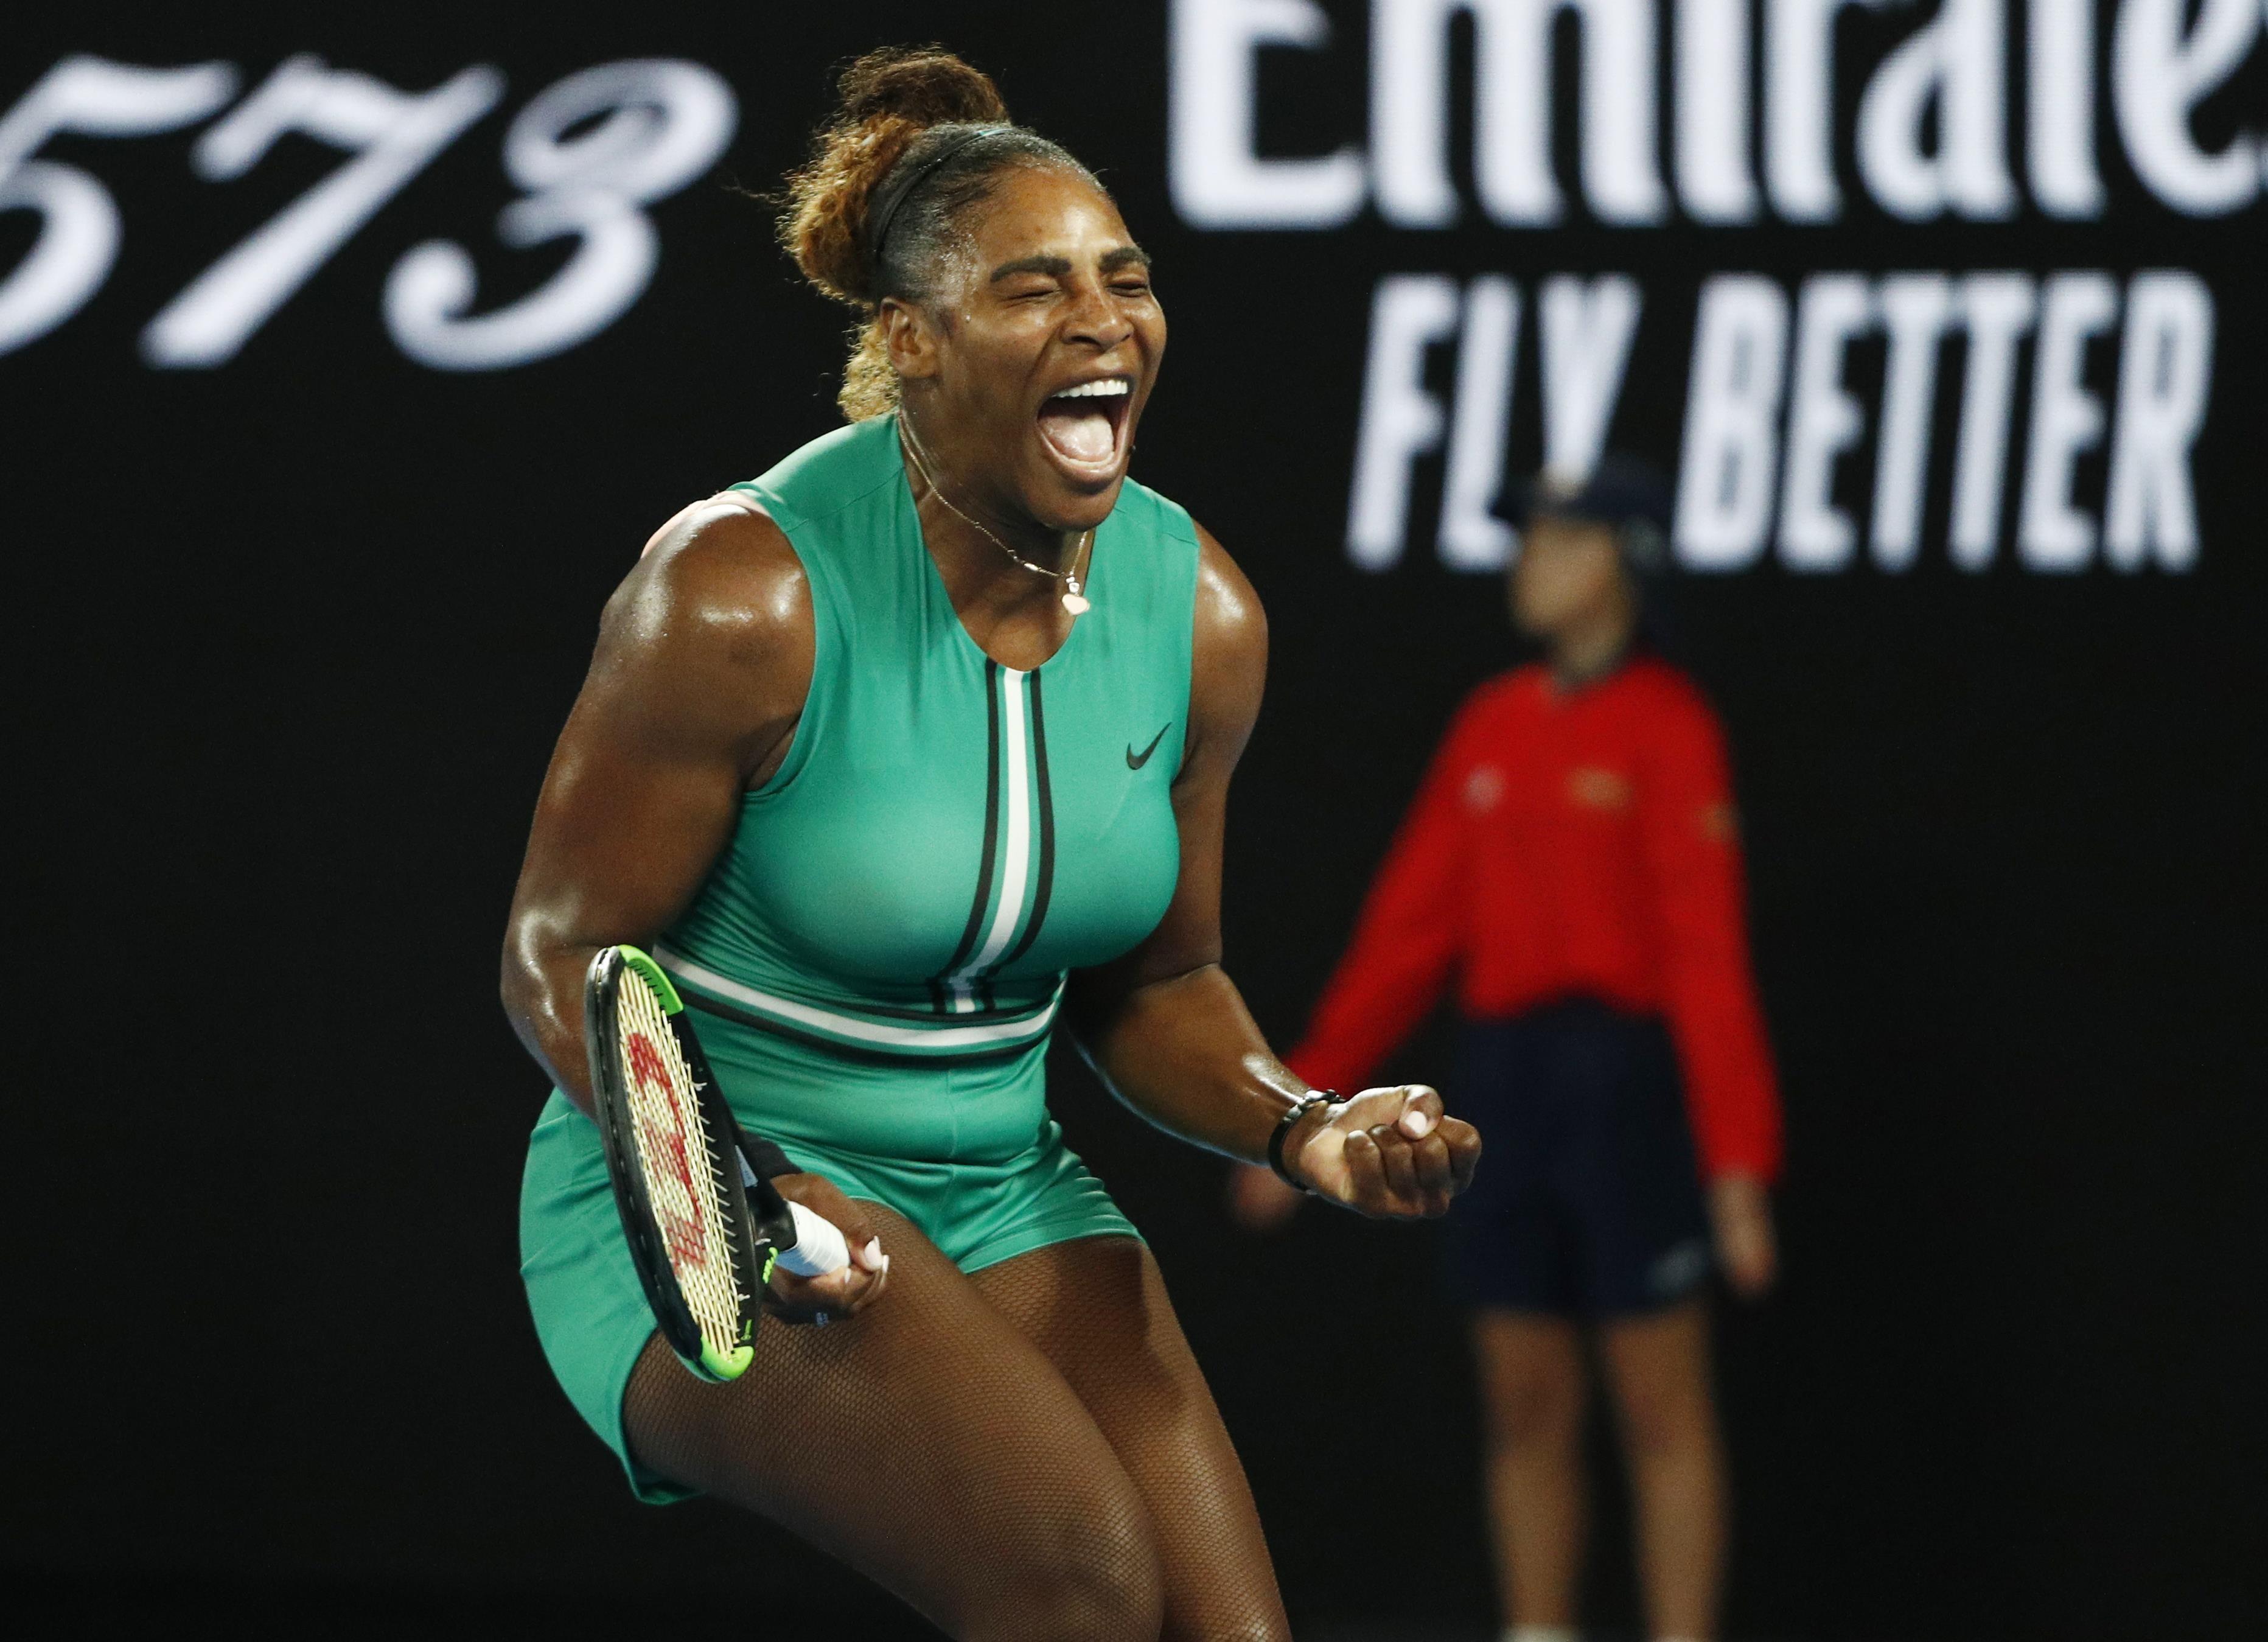 Serena Williams vibra na partida contra Halep